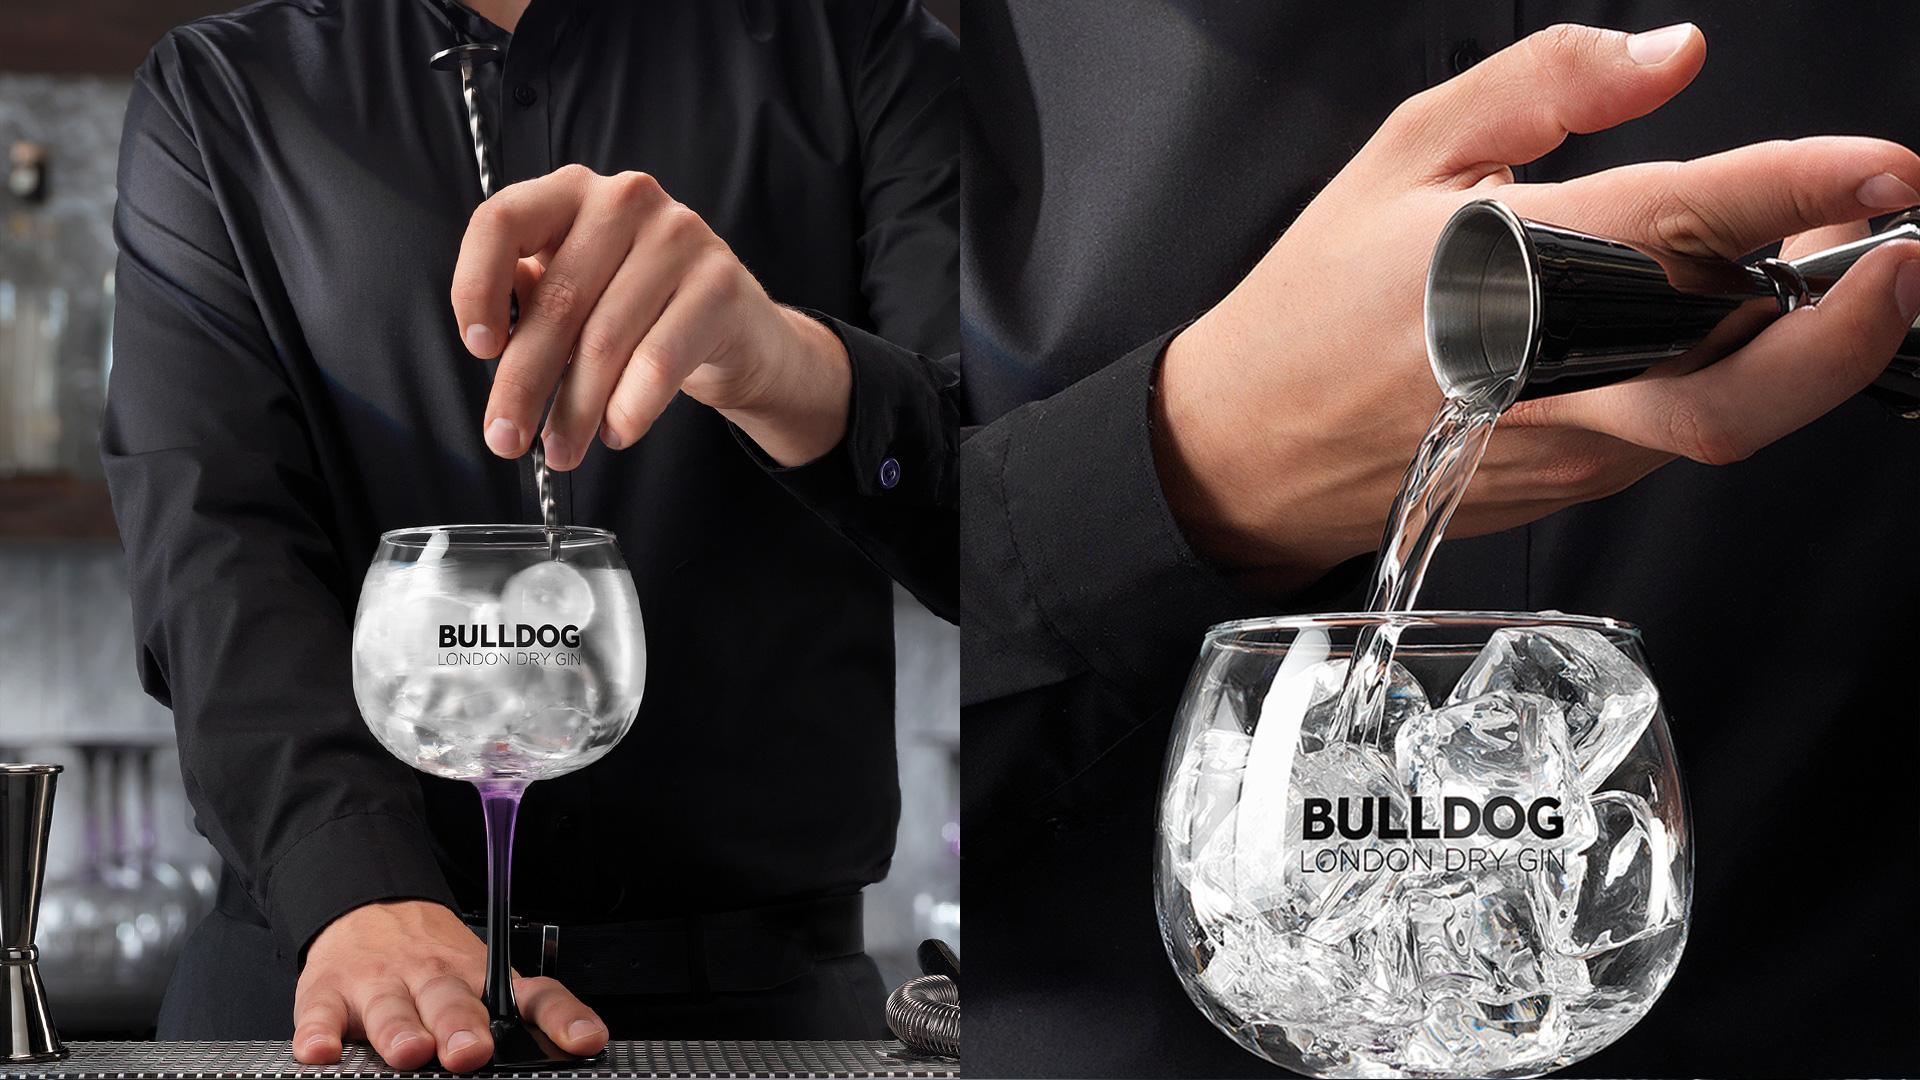 Bulldog-Rba-Design-002